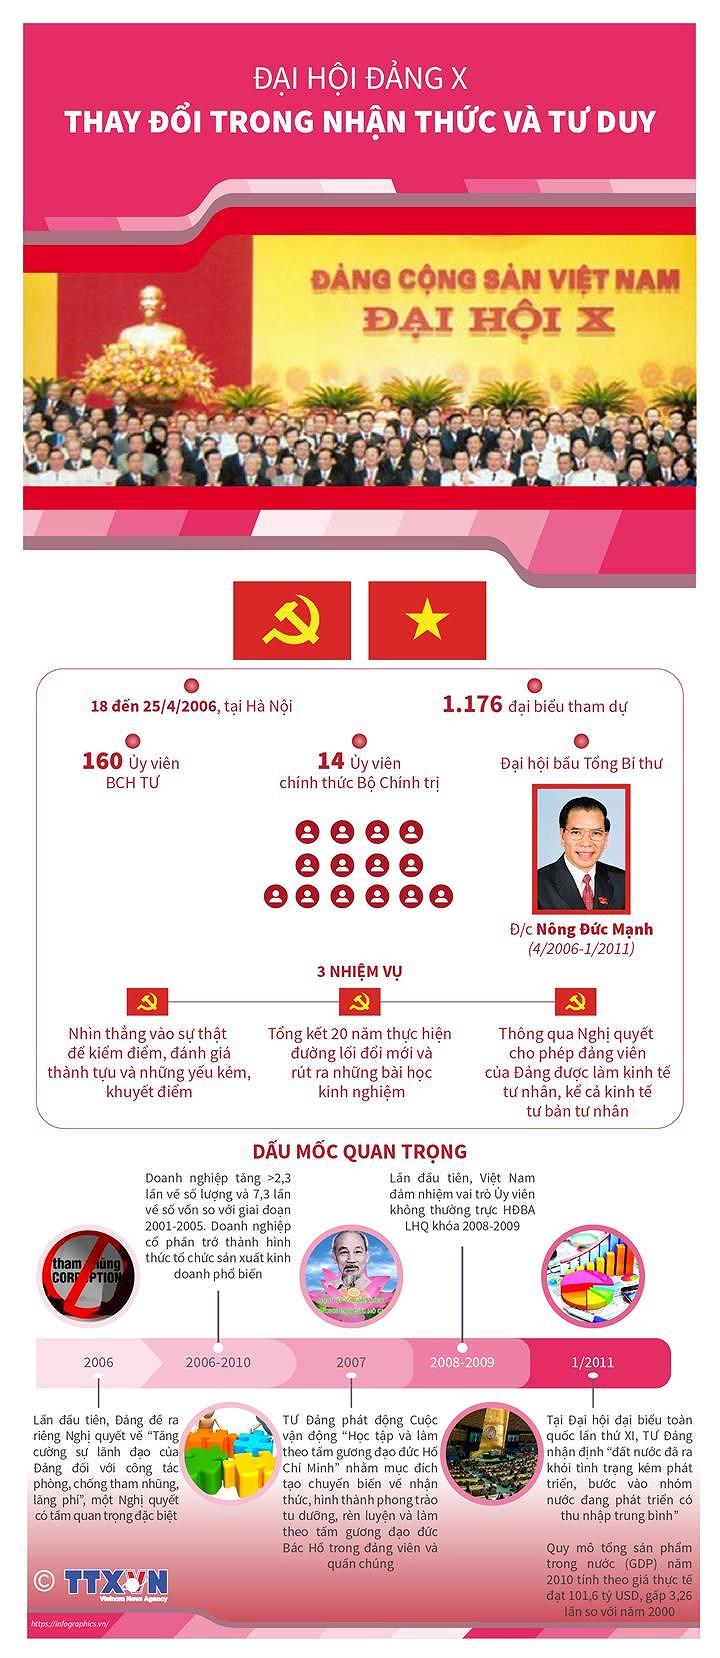 [Infographics] Dai hoi Dang X: Thay doi trong nhan thuc va tu duy hinh anh 1